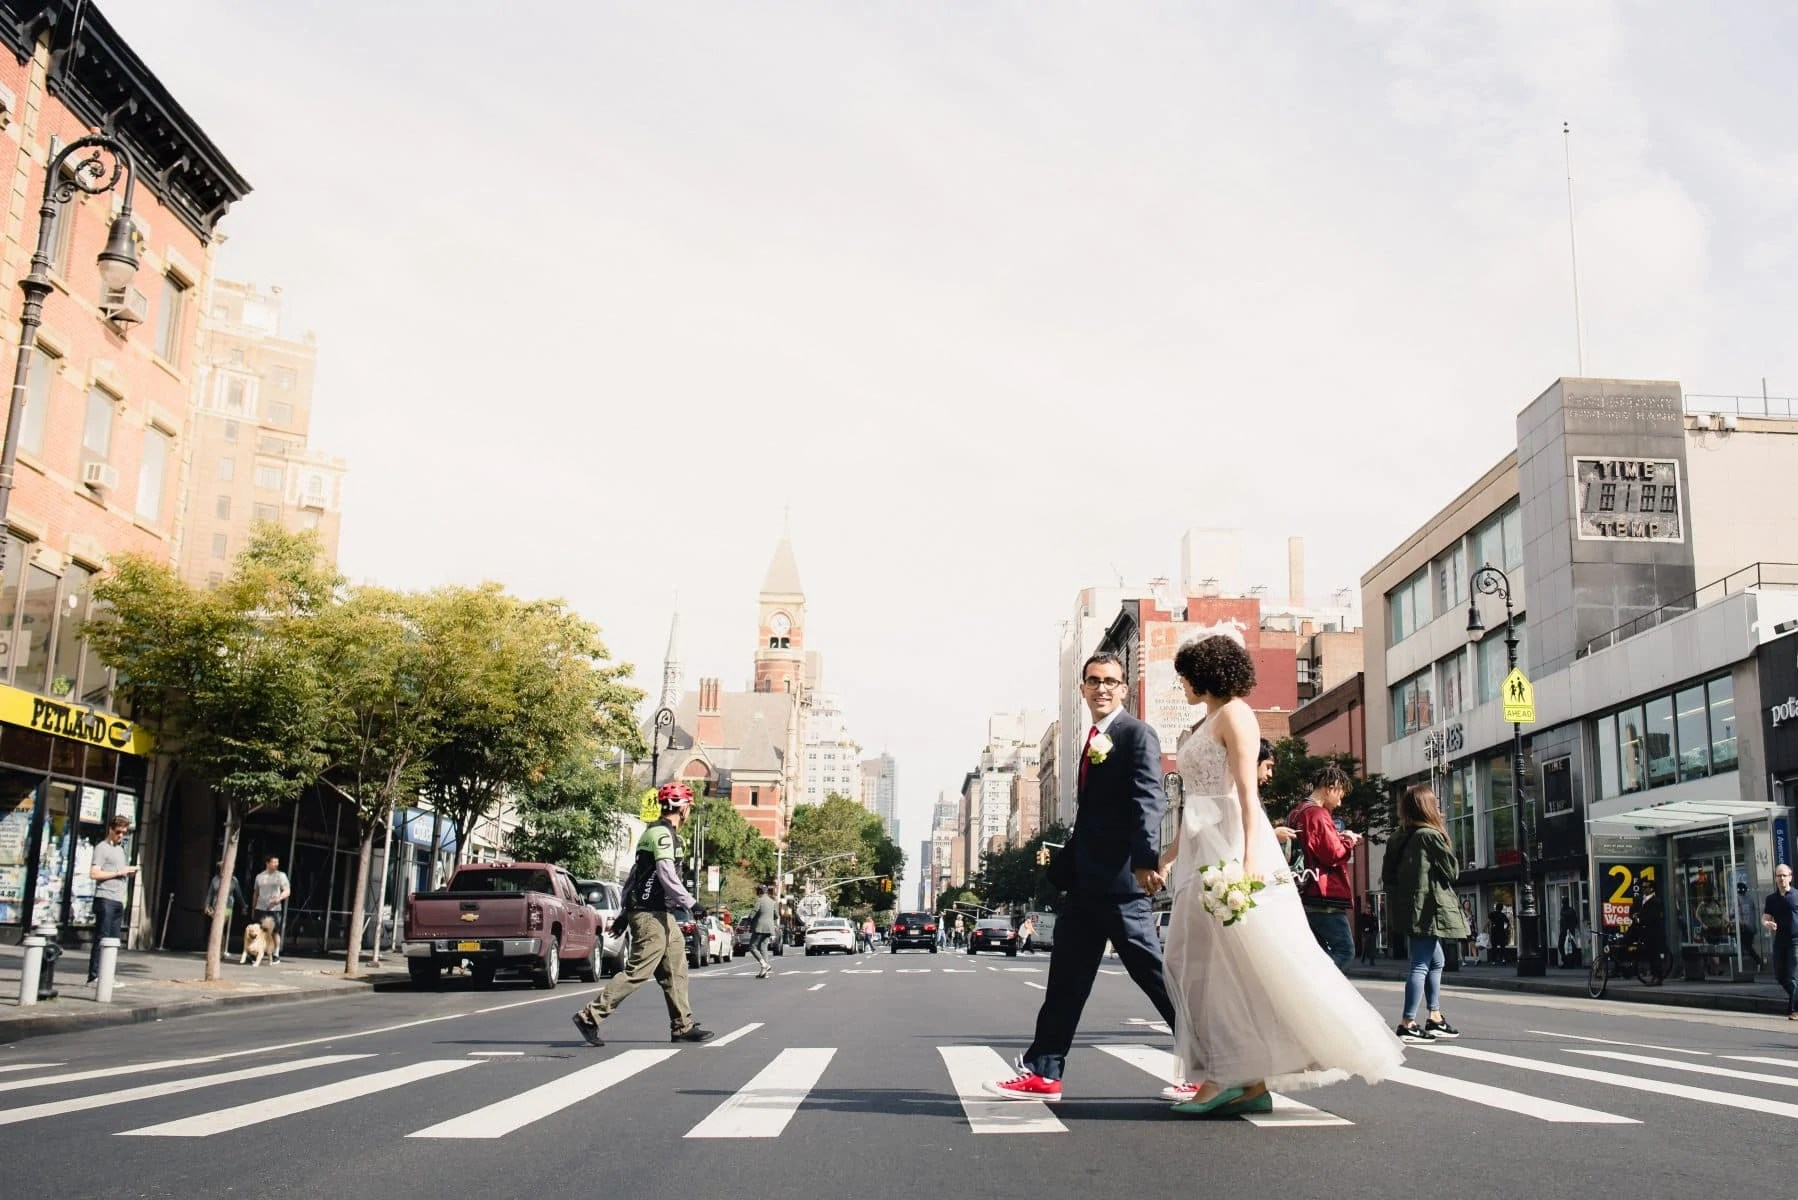 New York Elopement wedding